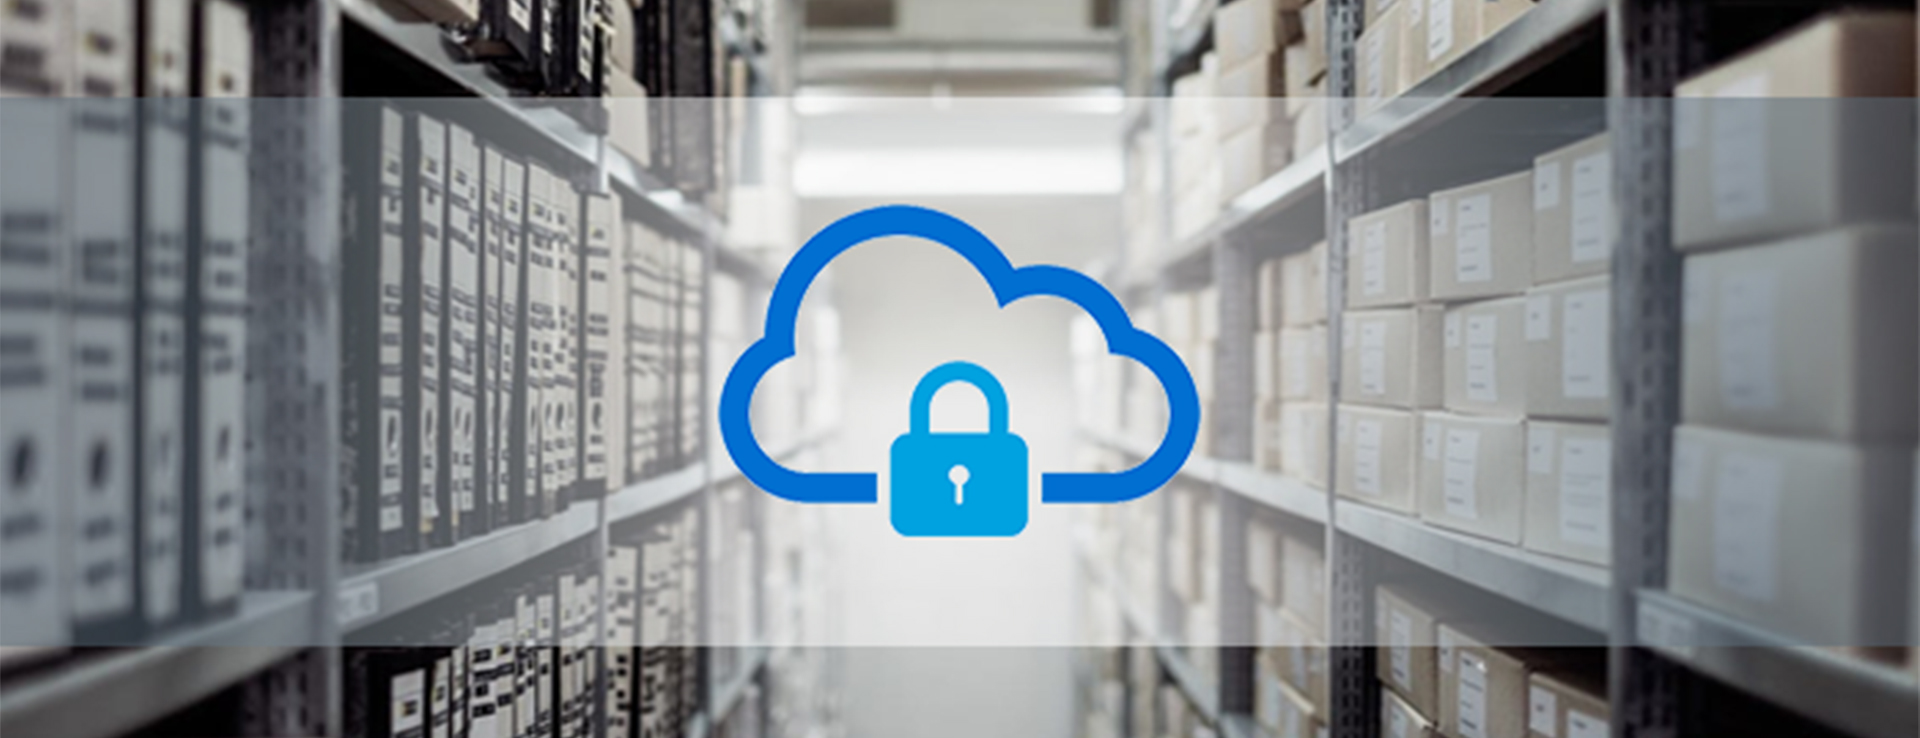 Cloud opslag en privacy